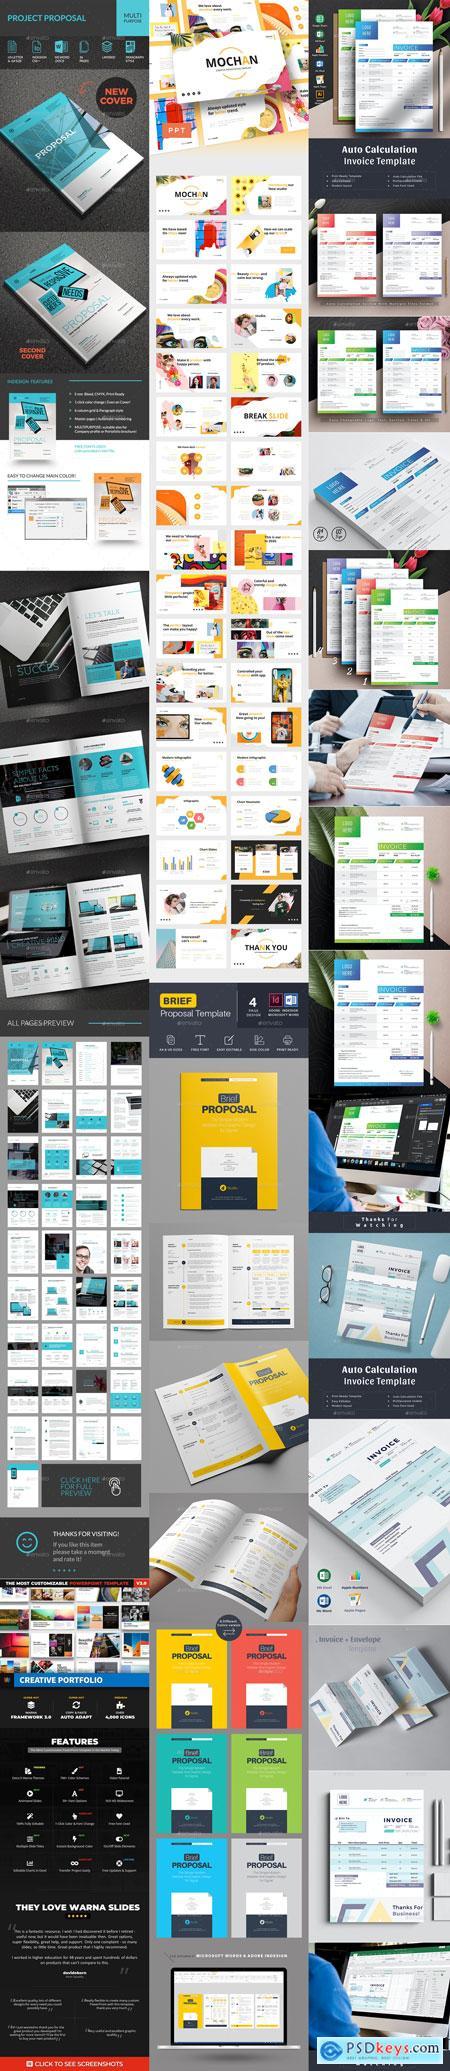 Presentation Templates Vip 29-SEP-2020 PREVIEW